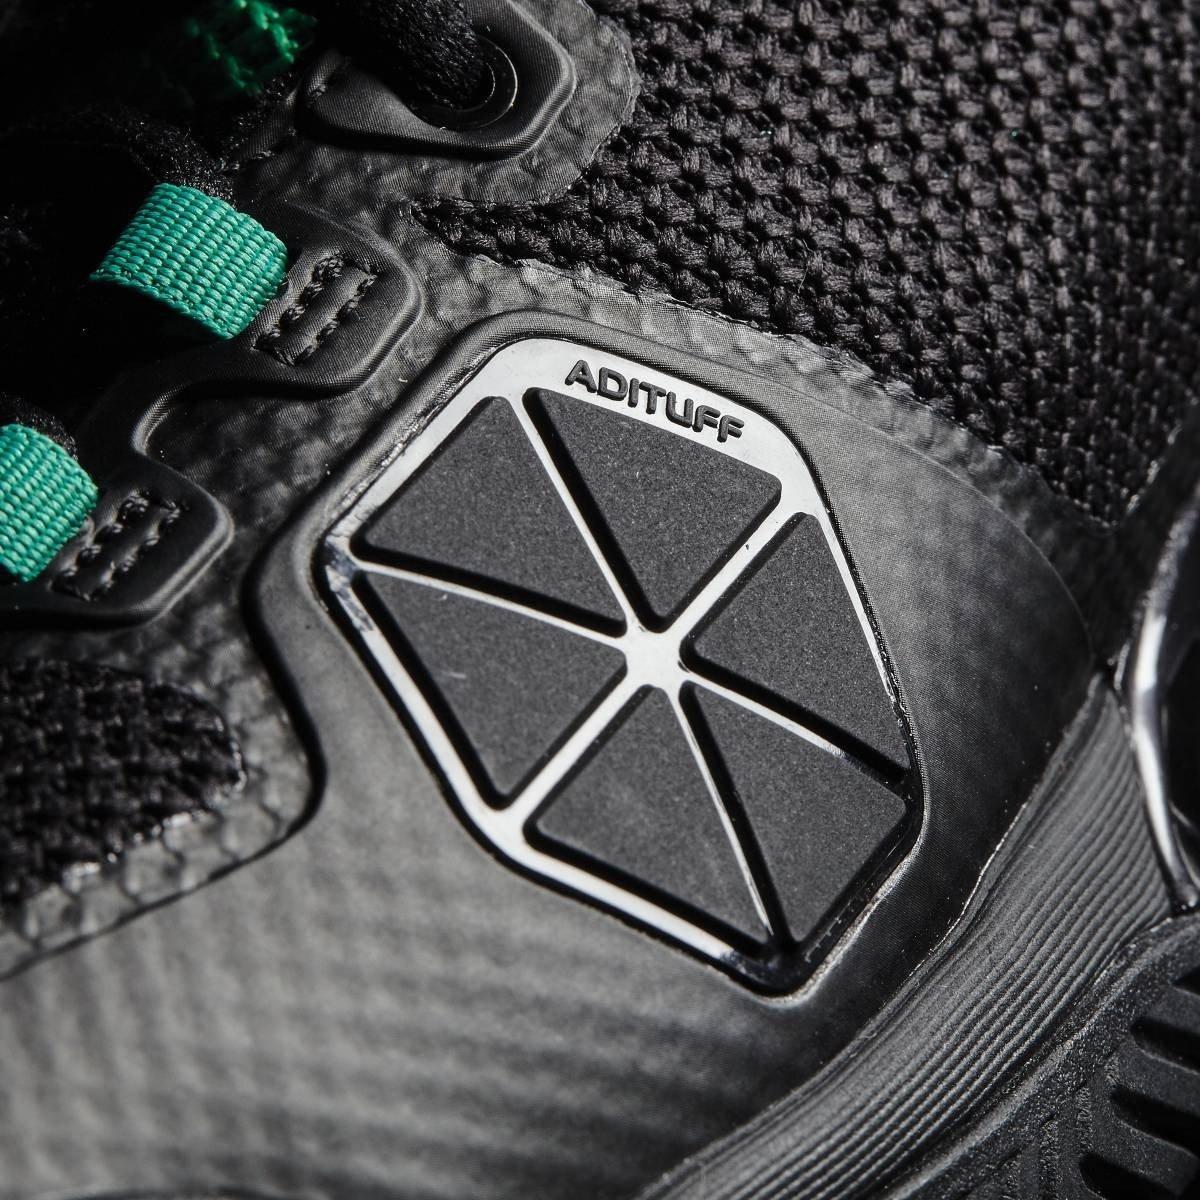 13 Boost Garros 2017 Adidas 45 Barricade Chaussure Roland trdQshC